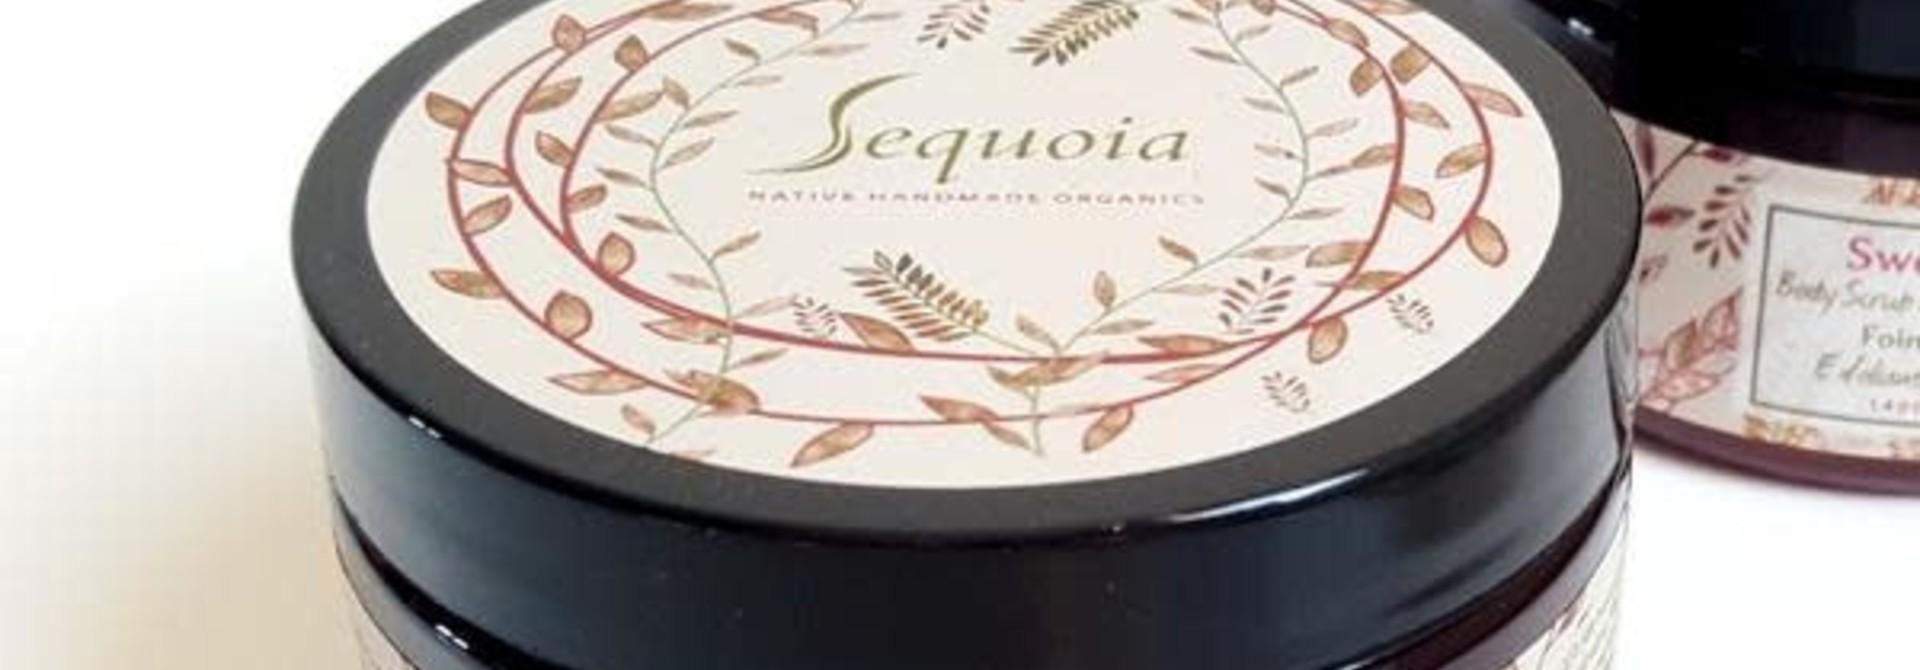 Sequoia 20 oz. Body Scrub- Sweetgrass